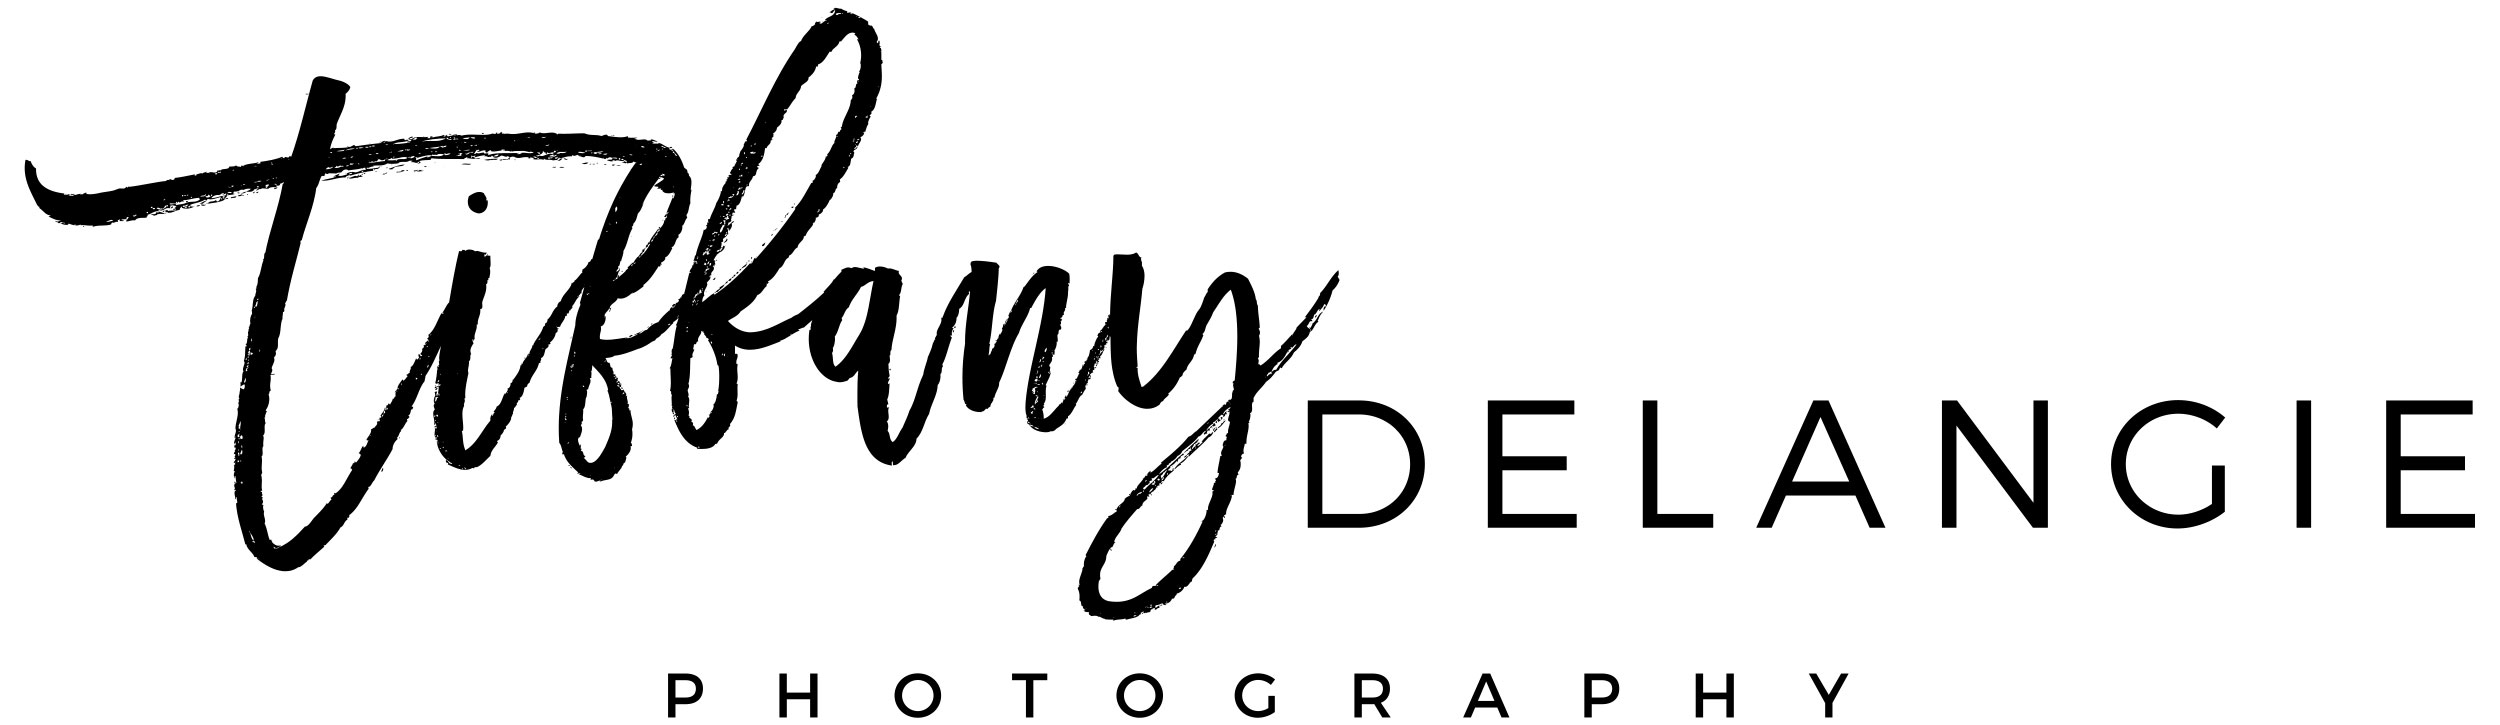 Sponsor Tiffany Delangie Photography